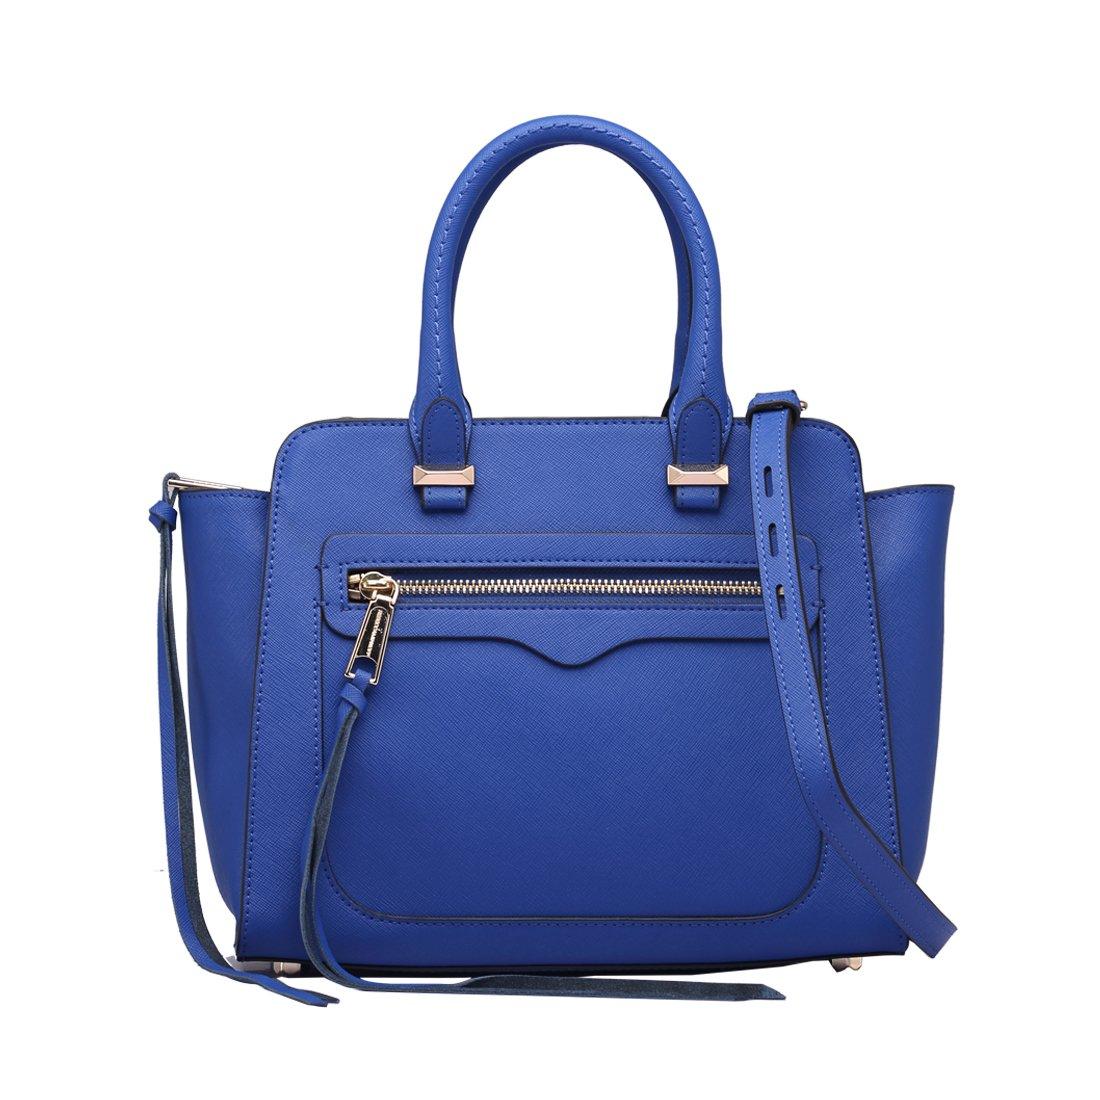 Women Love Mini Top Handle Leather Handbag Front Pocket Designer Purse Bag with Crossbody Strap (Blue)